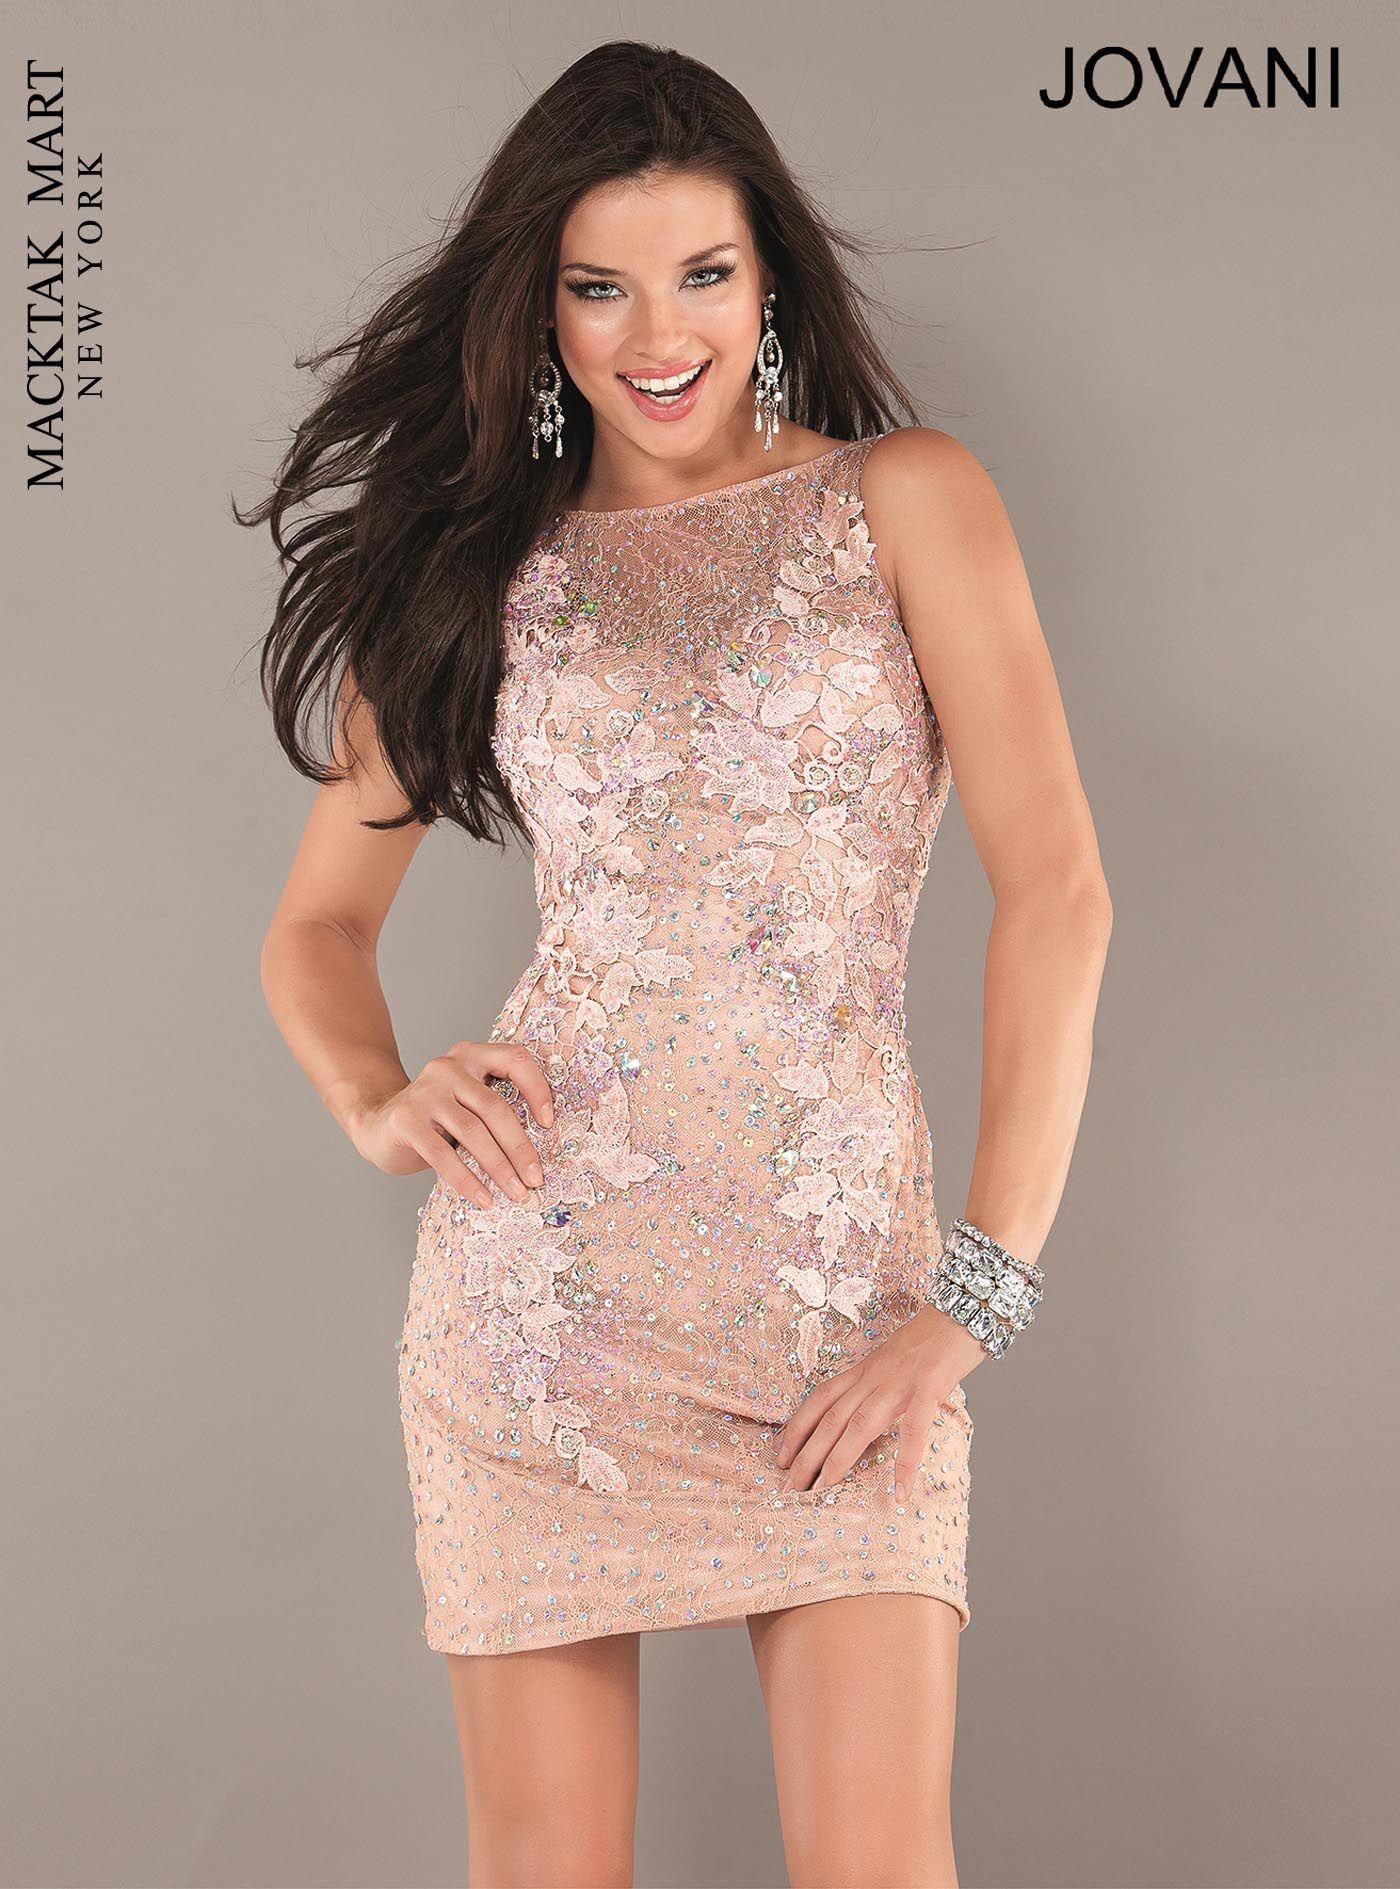 Jovani 816 Dress! http://macktakmart.com/jovani-prom-dresses-816 ...